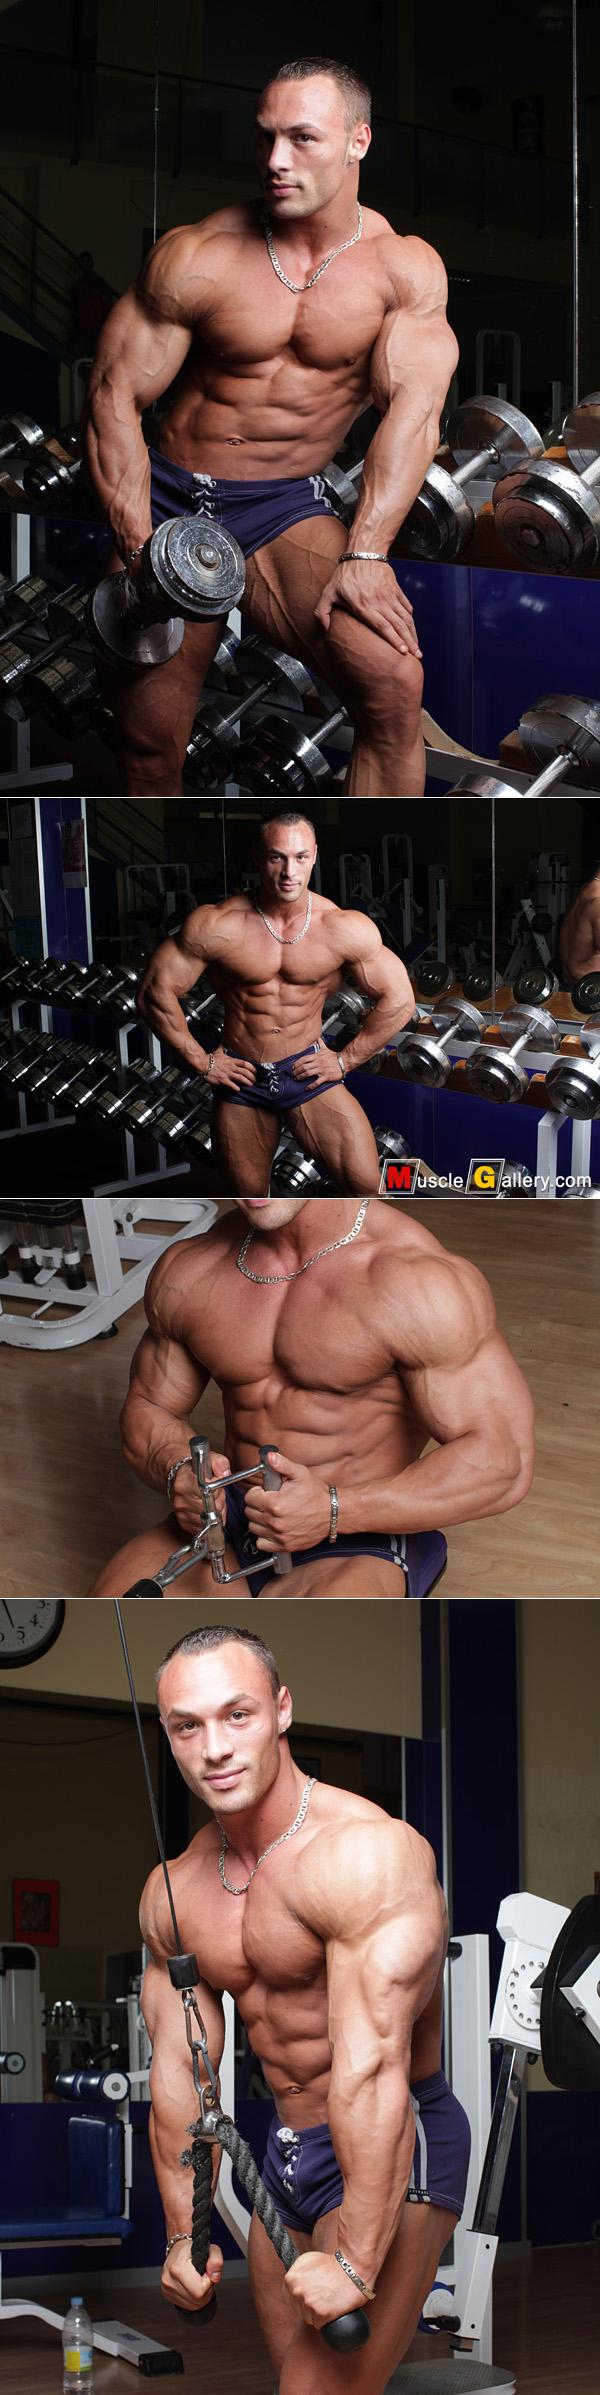 Bodybuilder Ludovic Bogaert working out